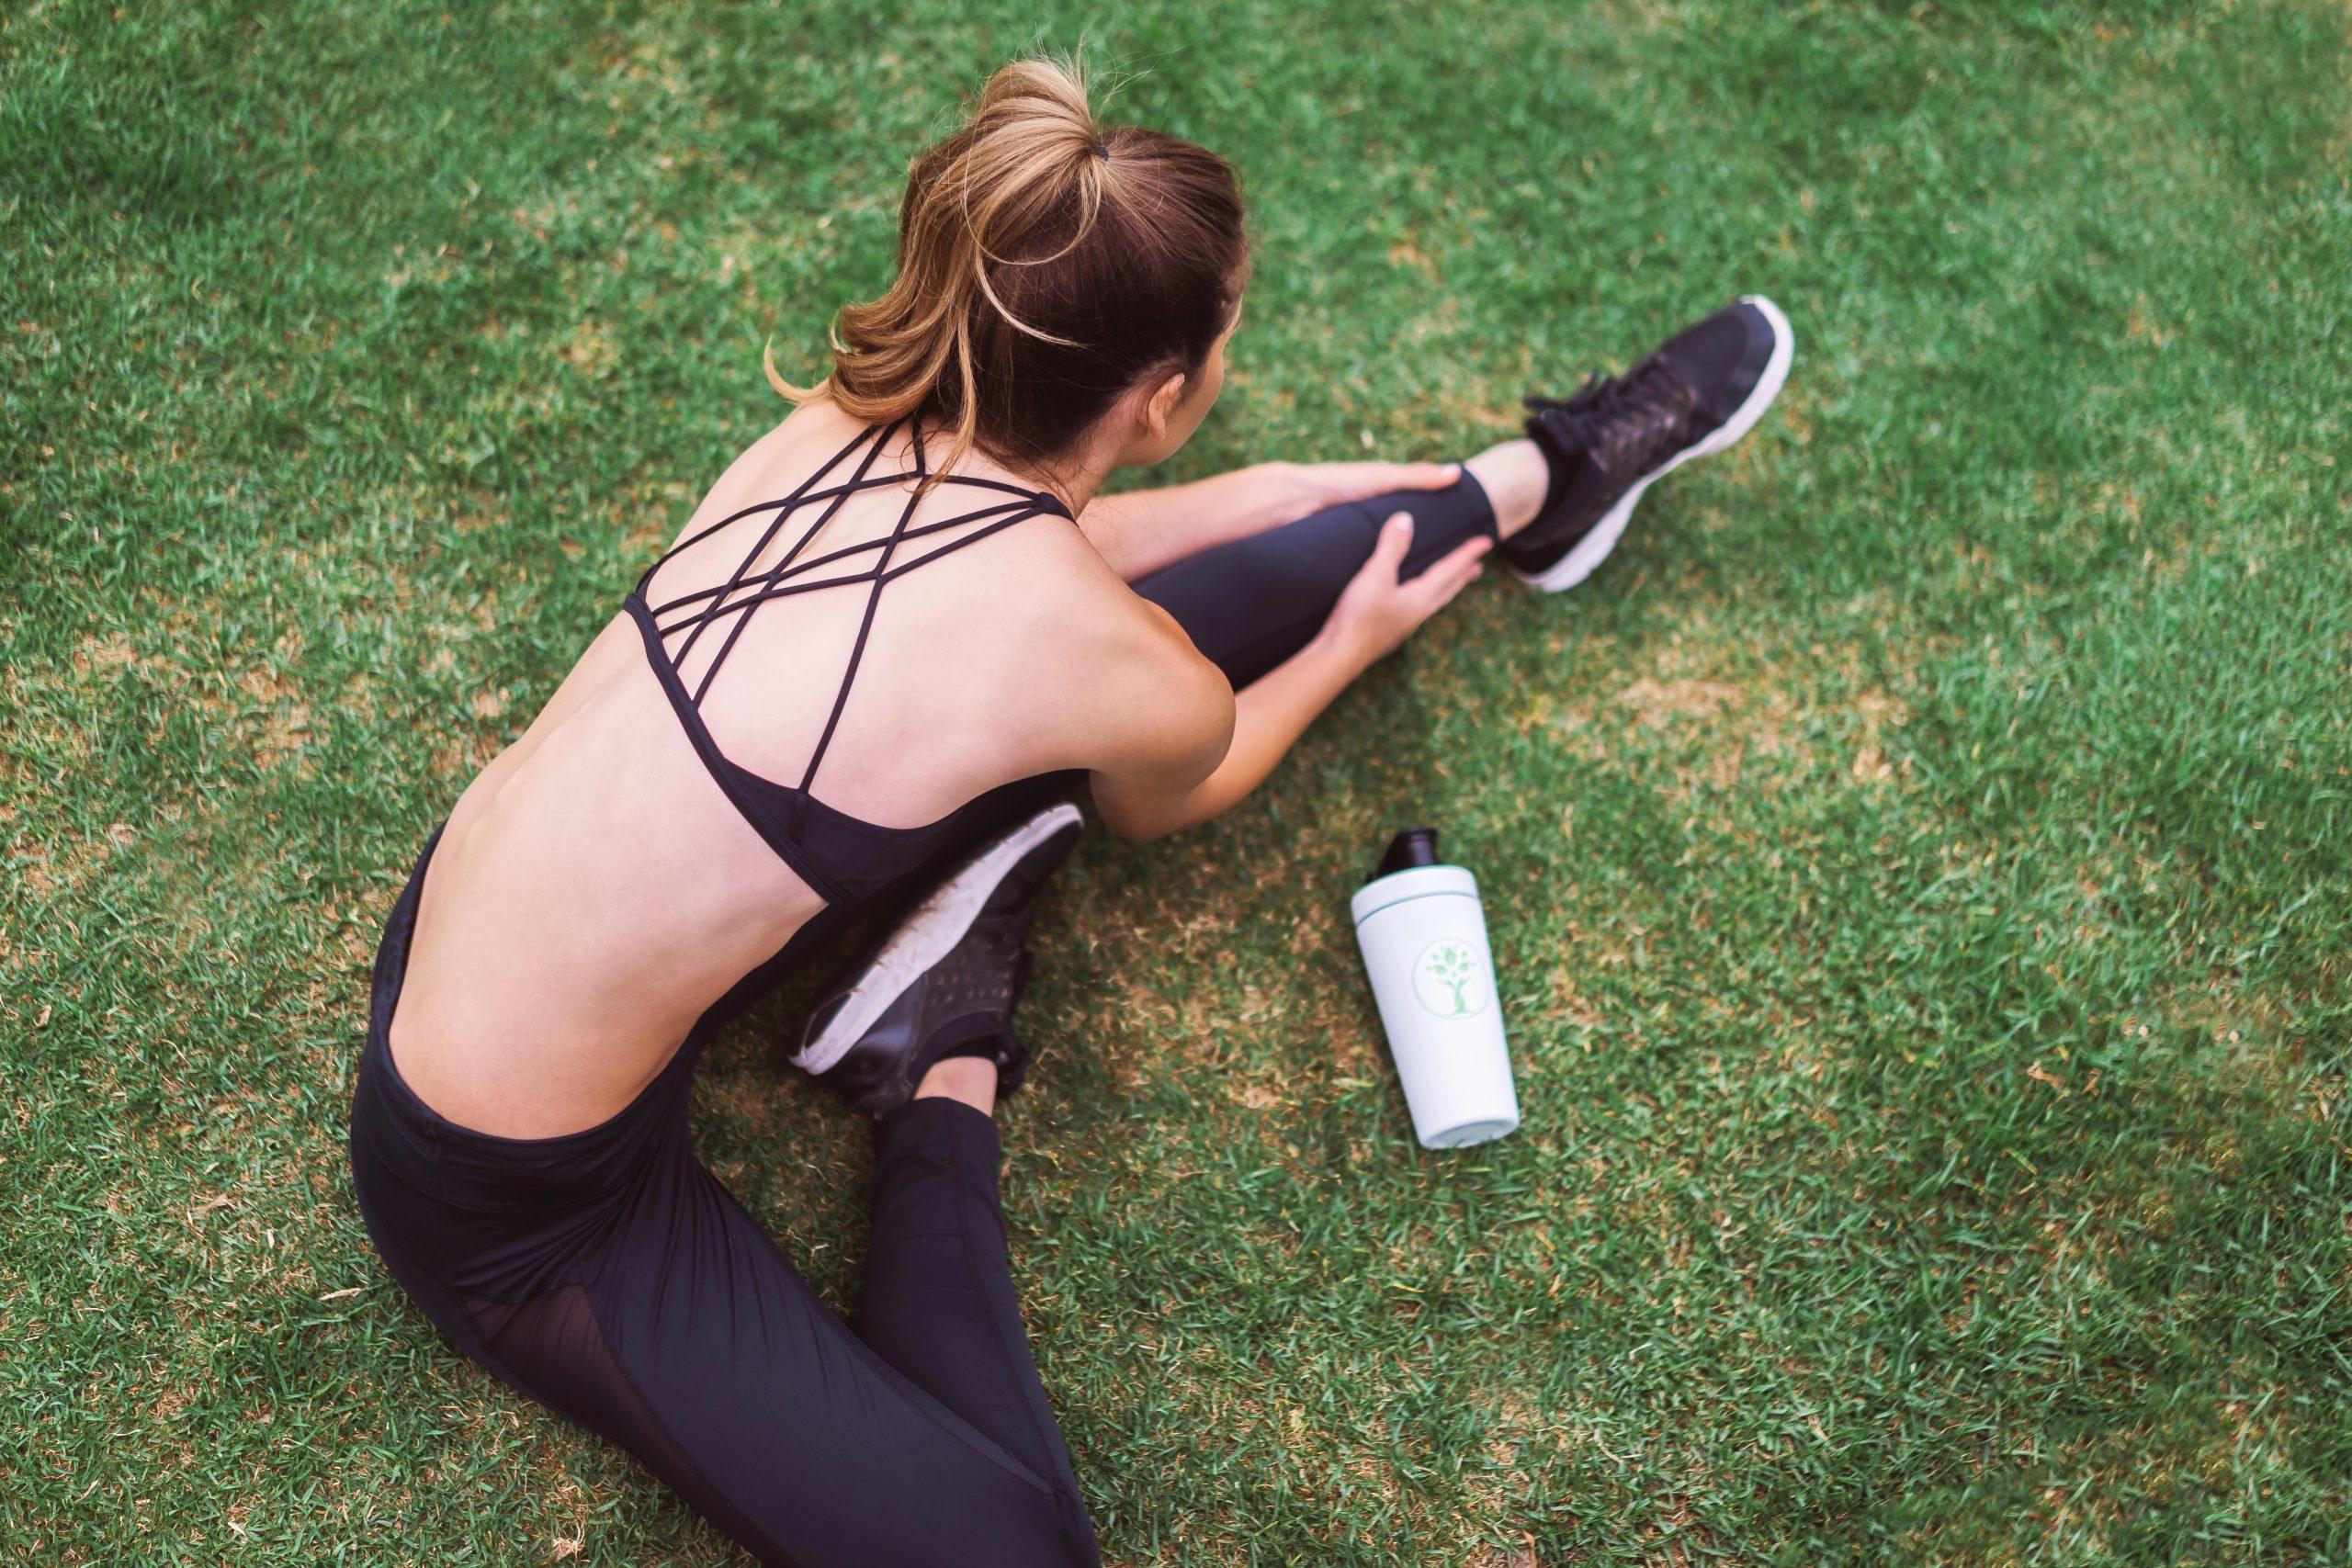 15 Manfaat Olahraga Bagi Kecantikan Tubuh 1